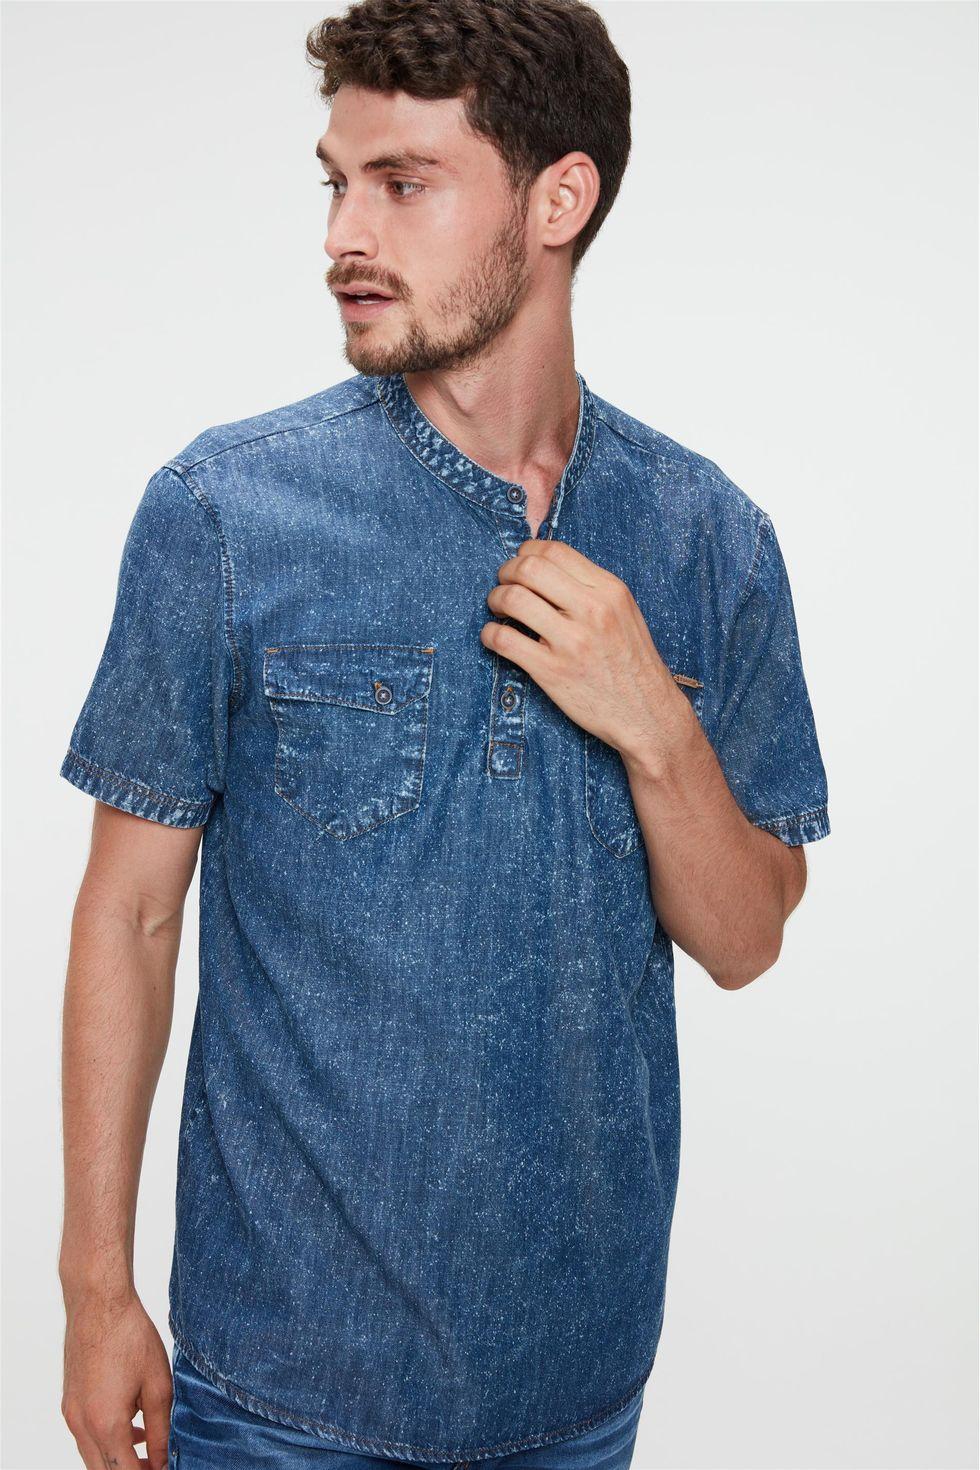 Bata-Jeans-de-Manga-Curta-Masculina-Frente--